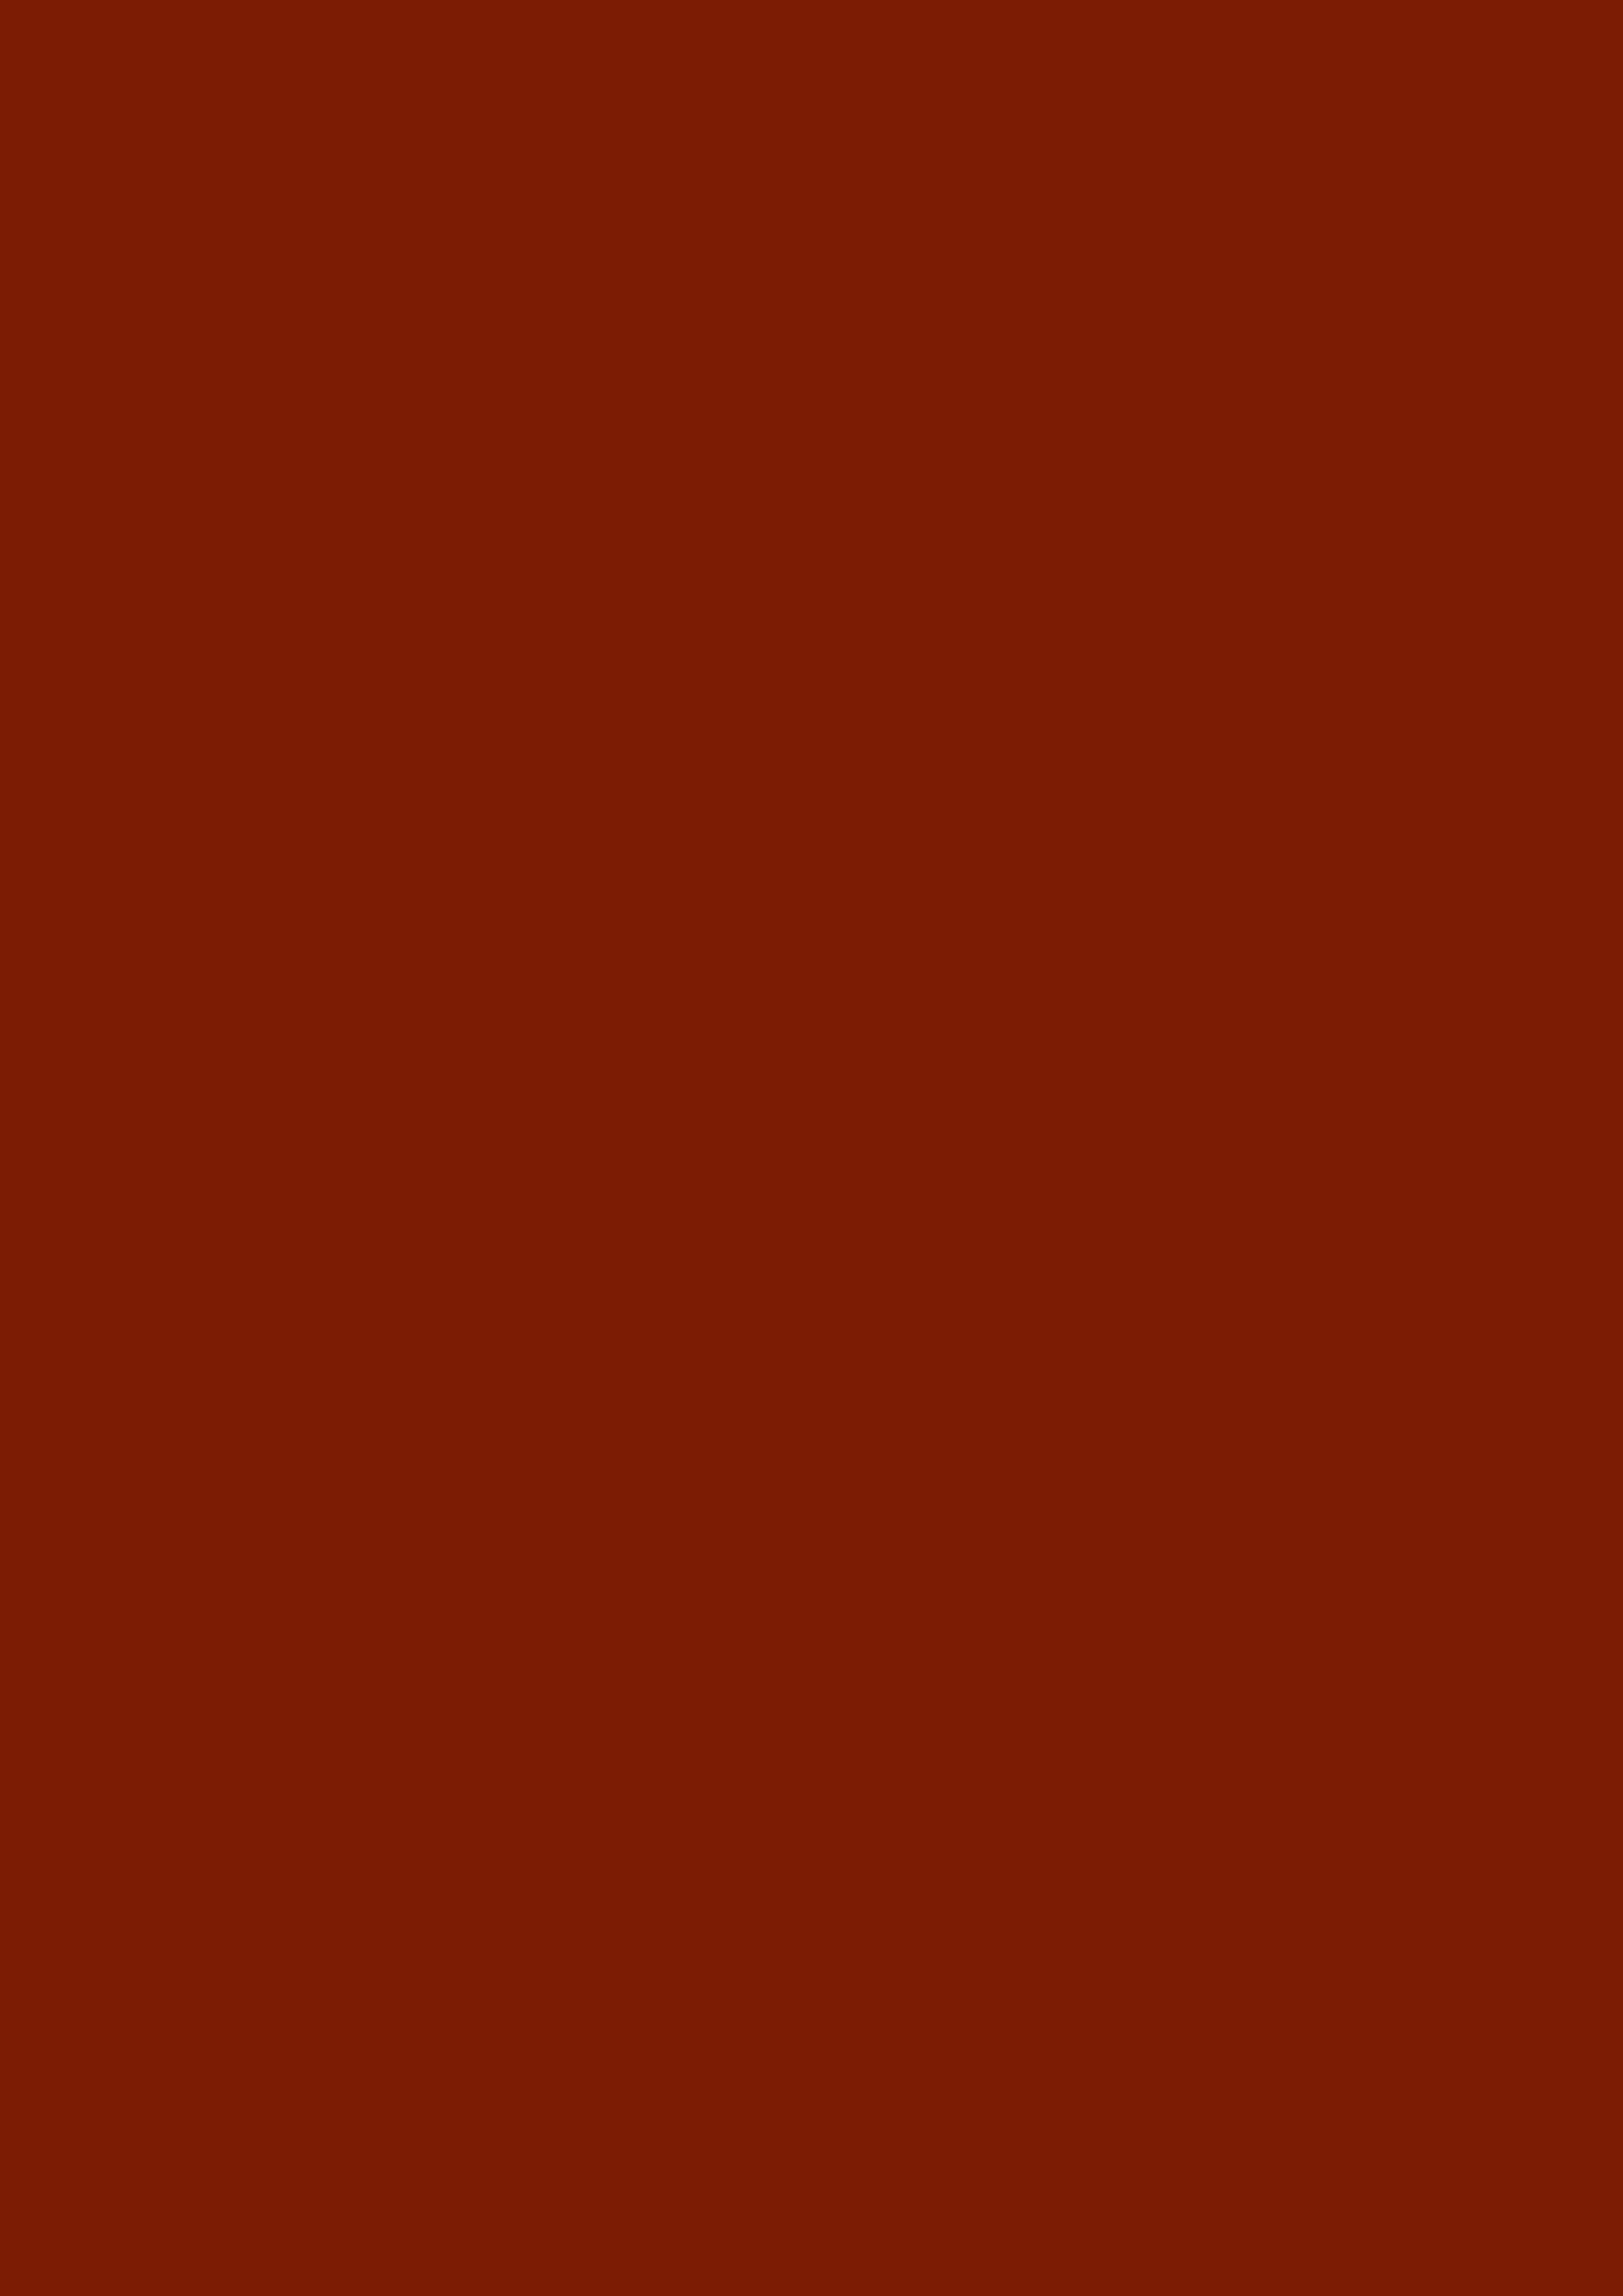 2480x3508 Kenyan Copper Solid Color Background